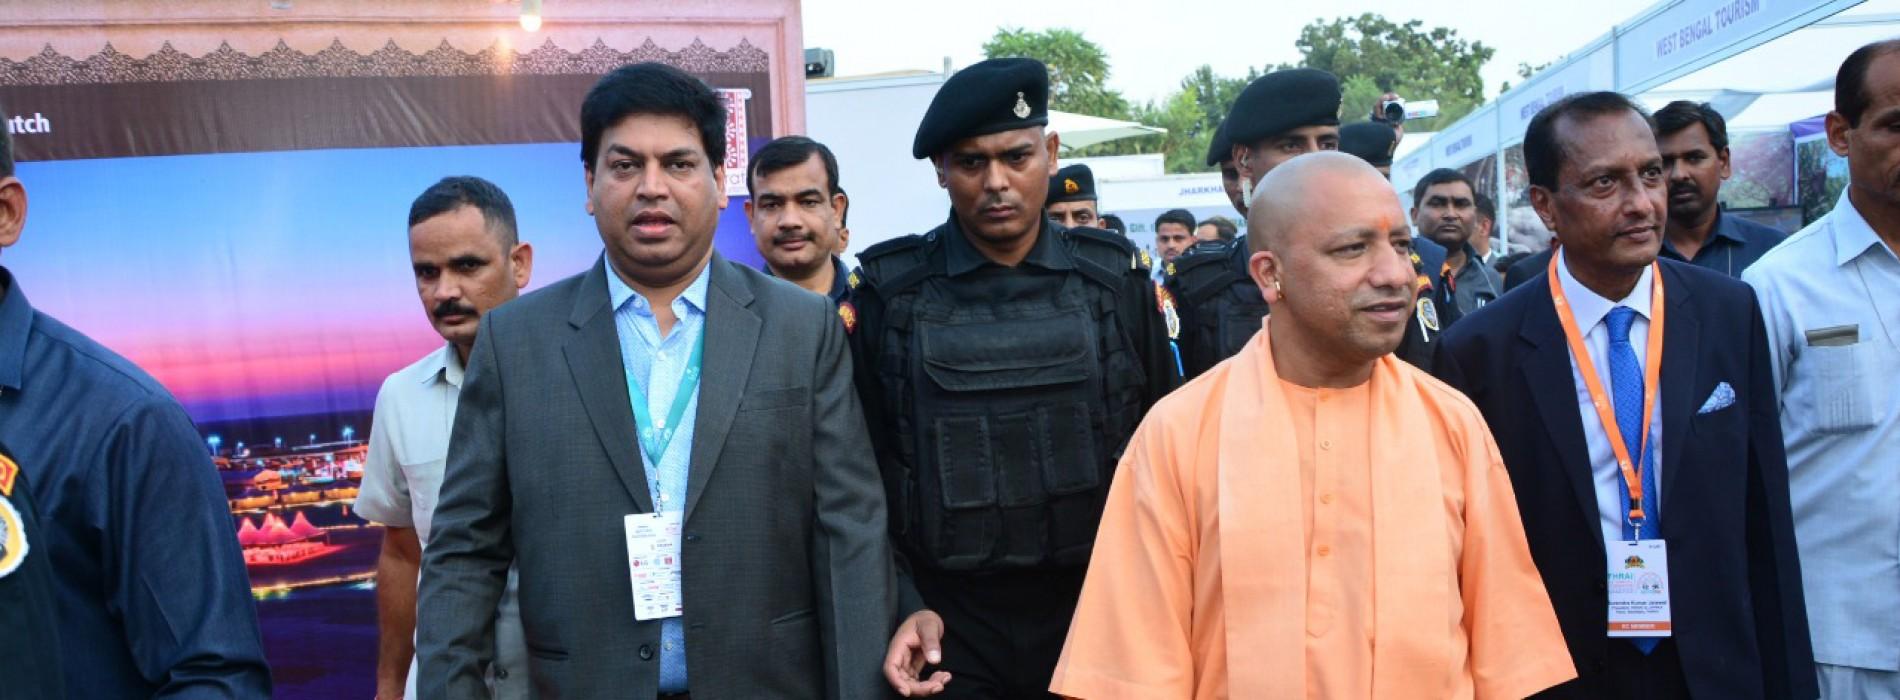 UP's CM Yogi inaugurates ITM Lucknow